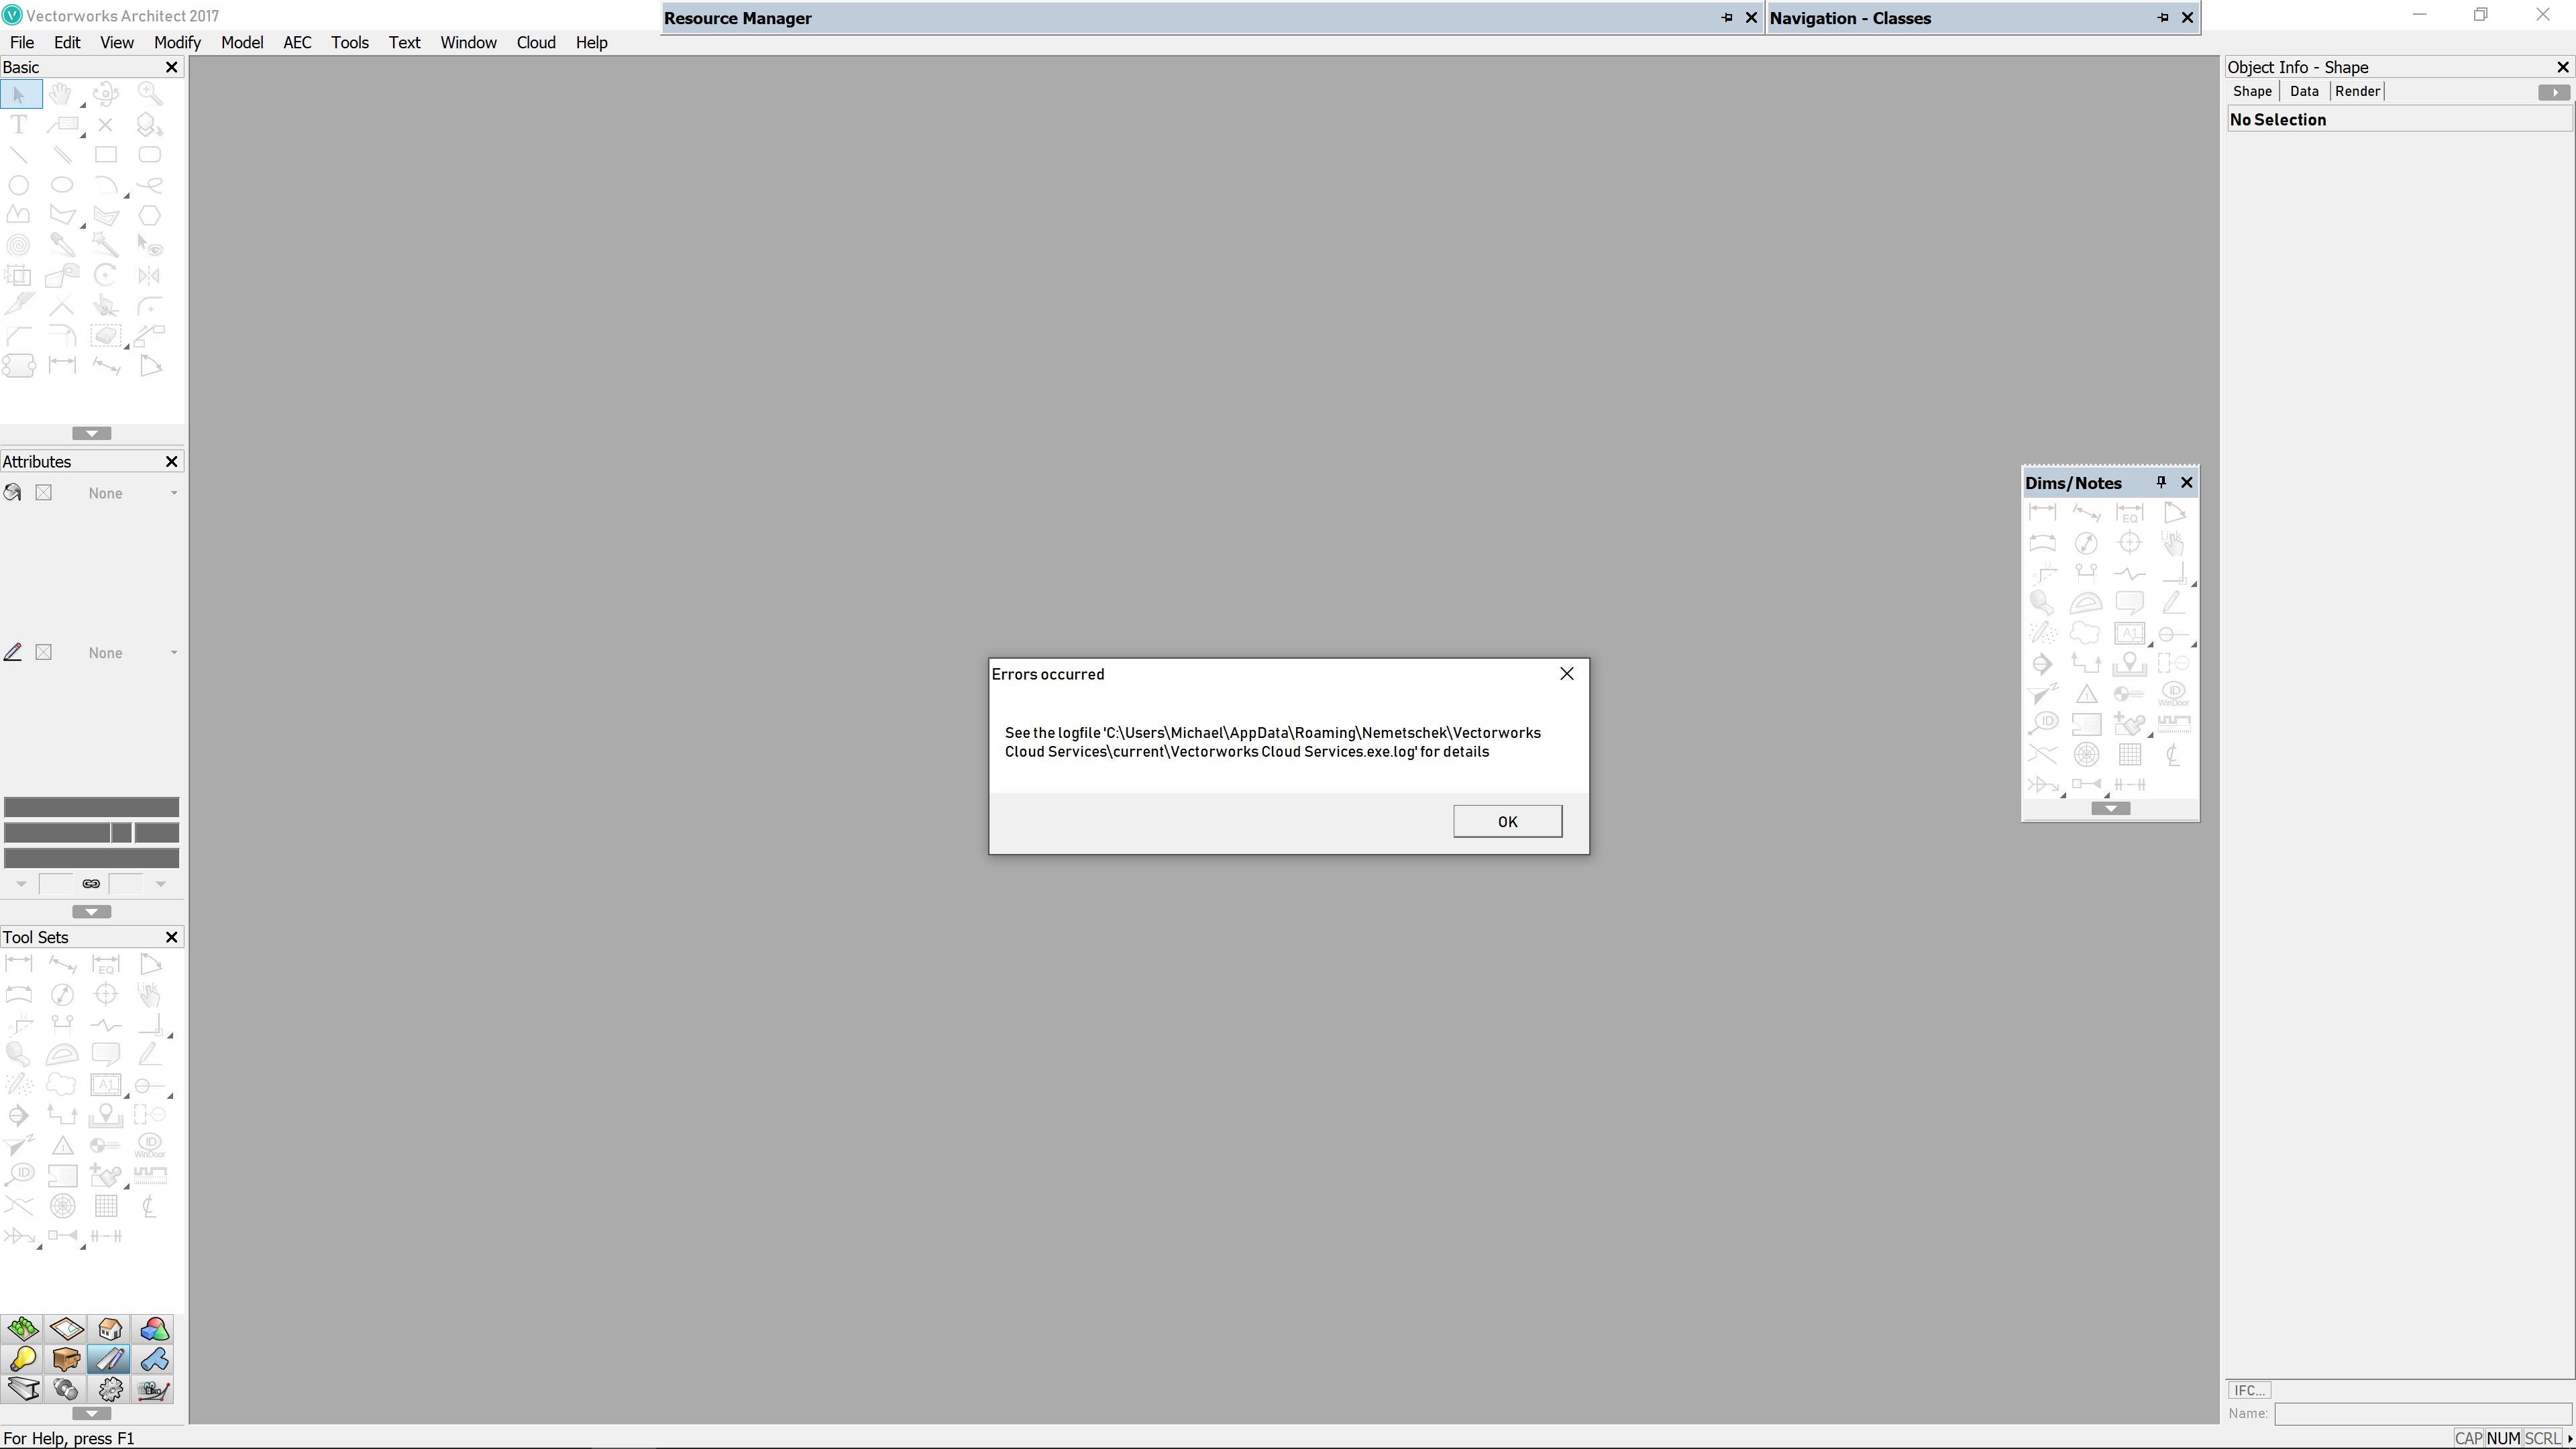 59e6ccd60a7f9_Screenshot(2).png.7a4faca050b80c82ef837b0789a1529a.png